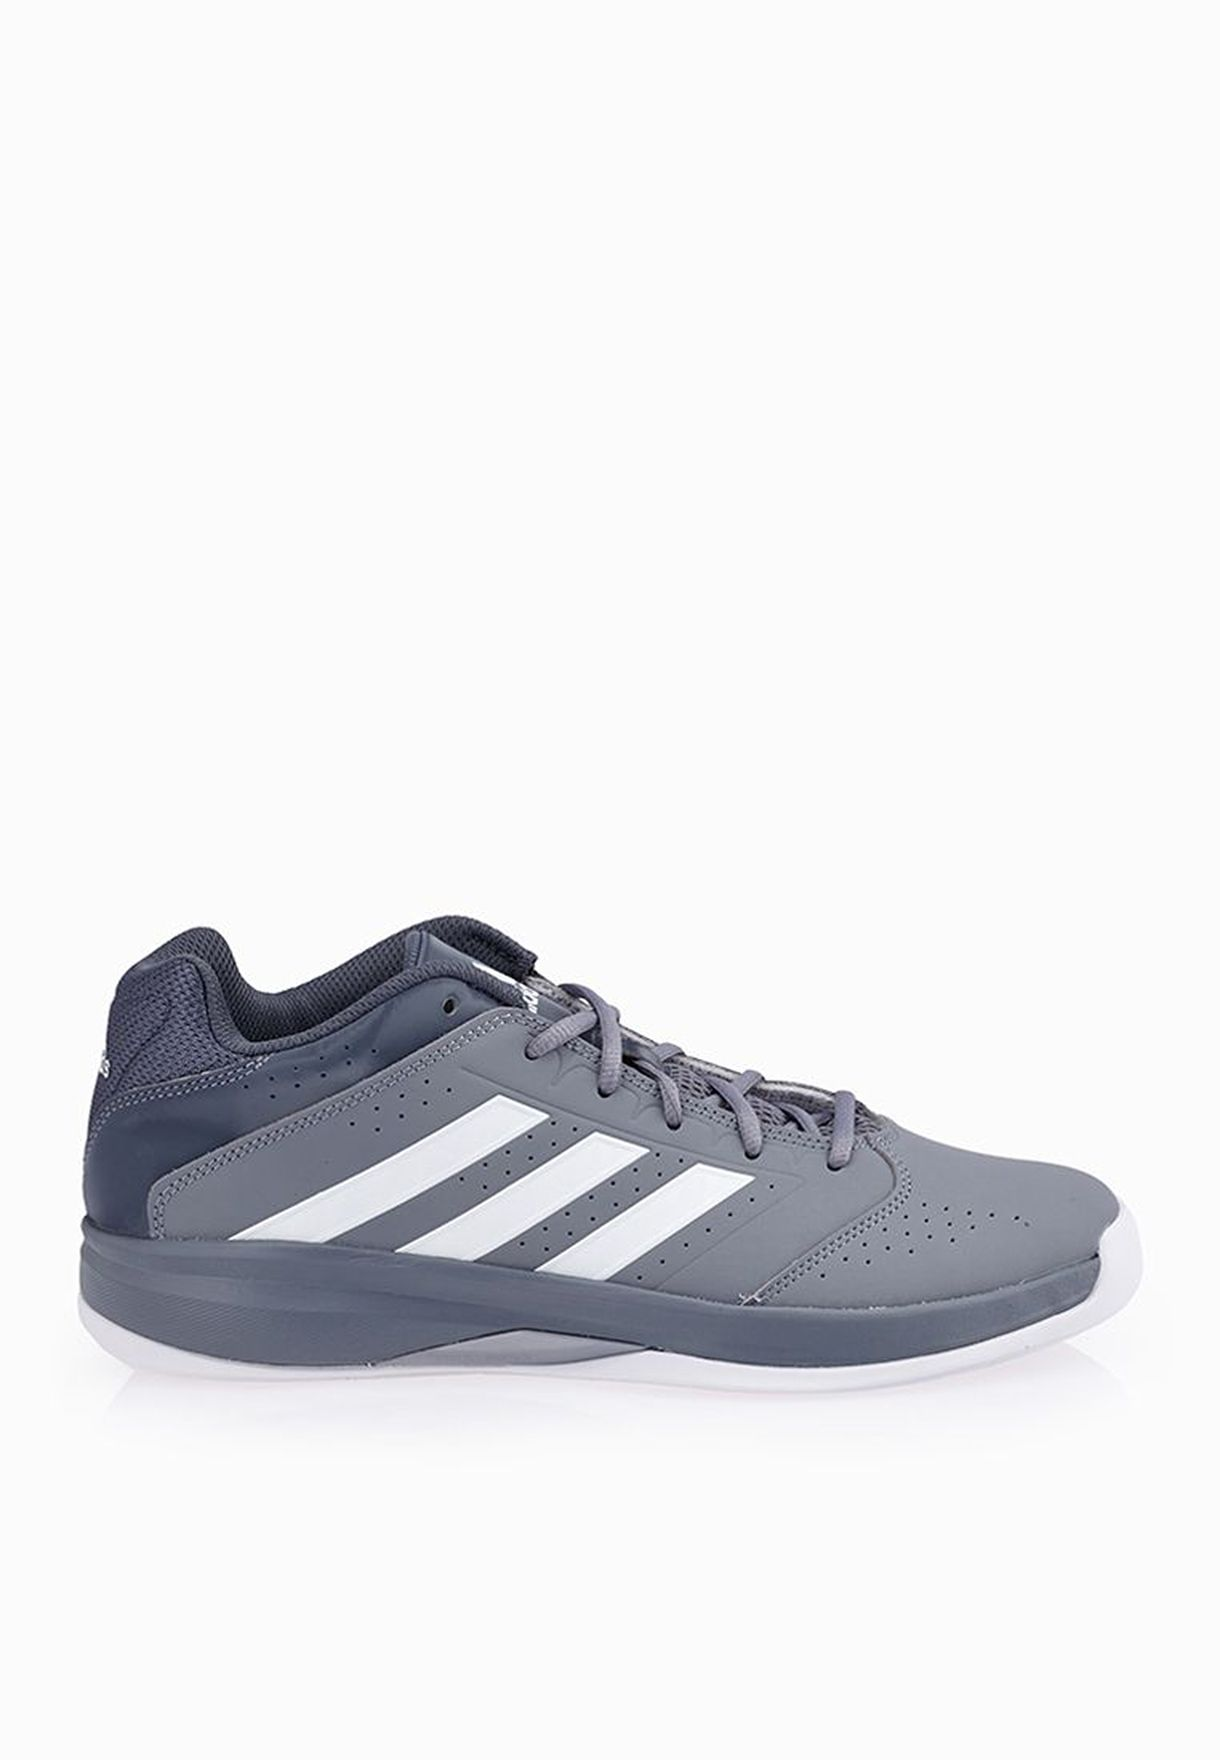 Foto Snjeguljica Lijecnik Adidas Isolation 2 Mid Sneakers Goldstandardsounds Com